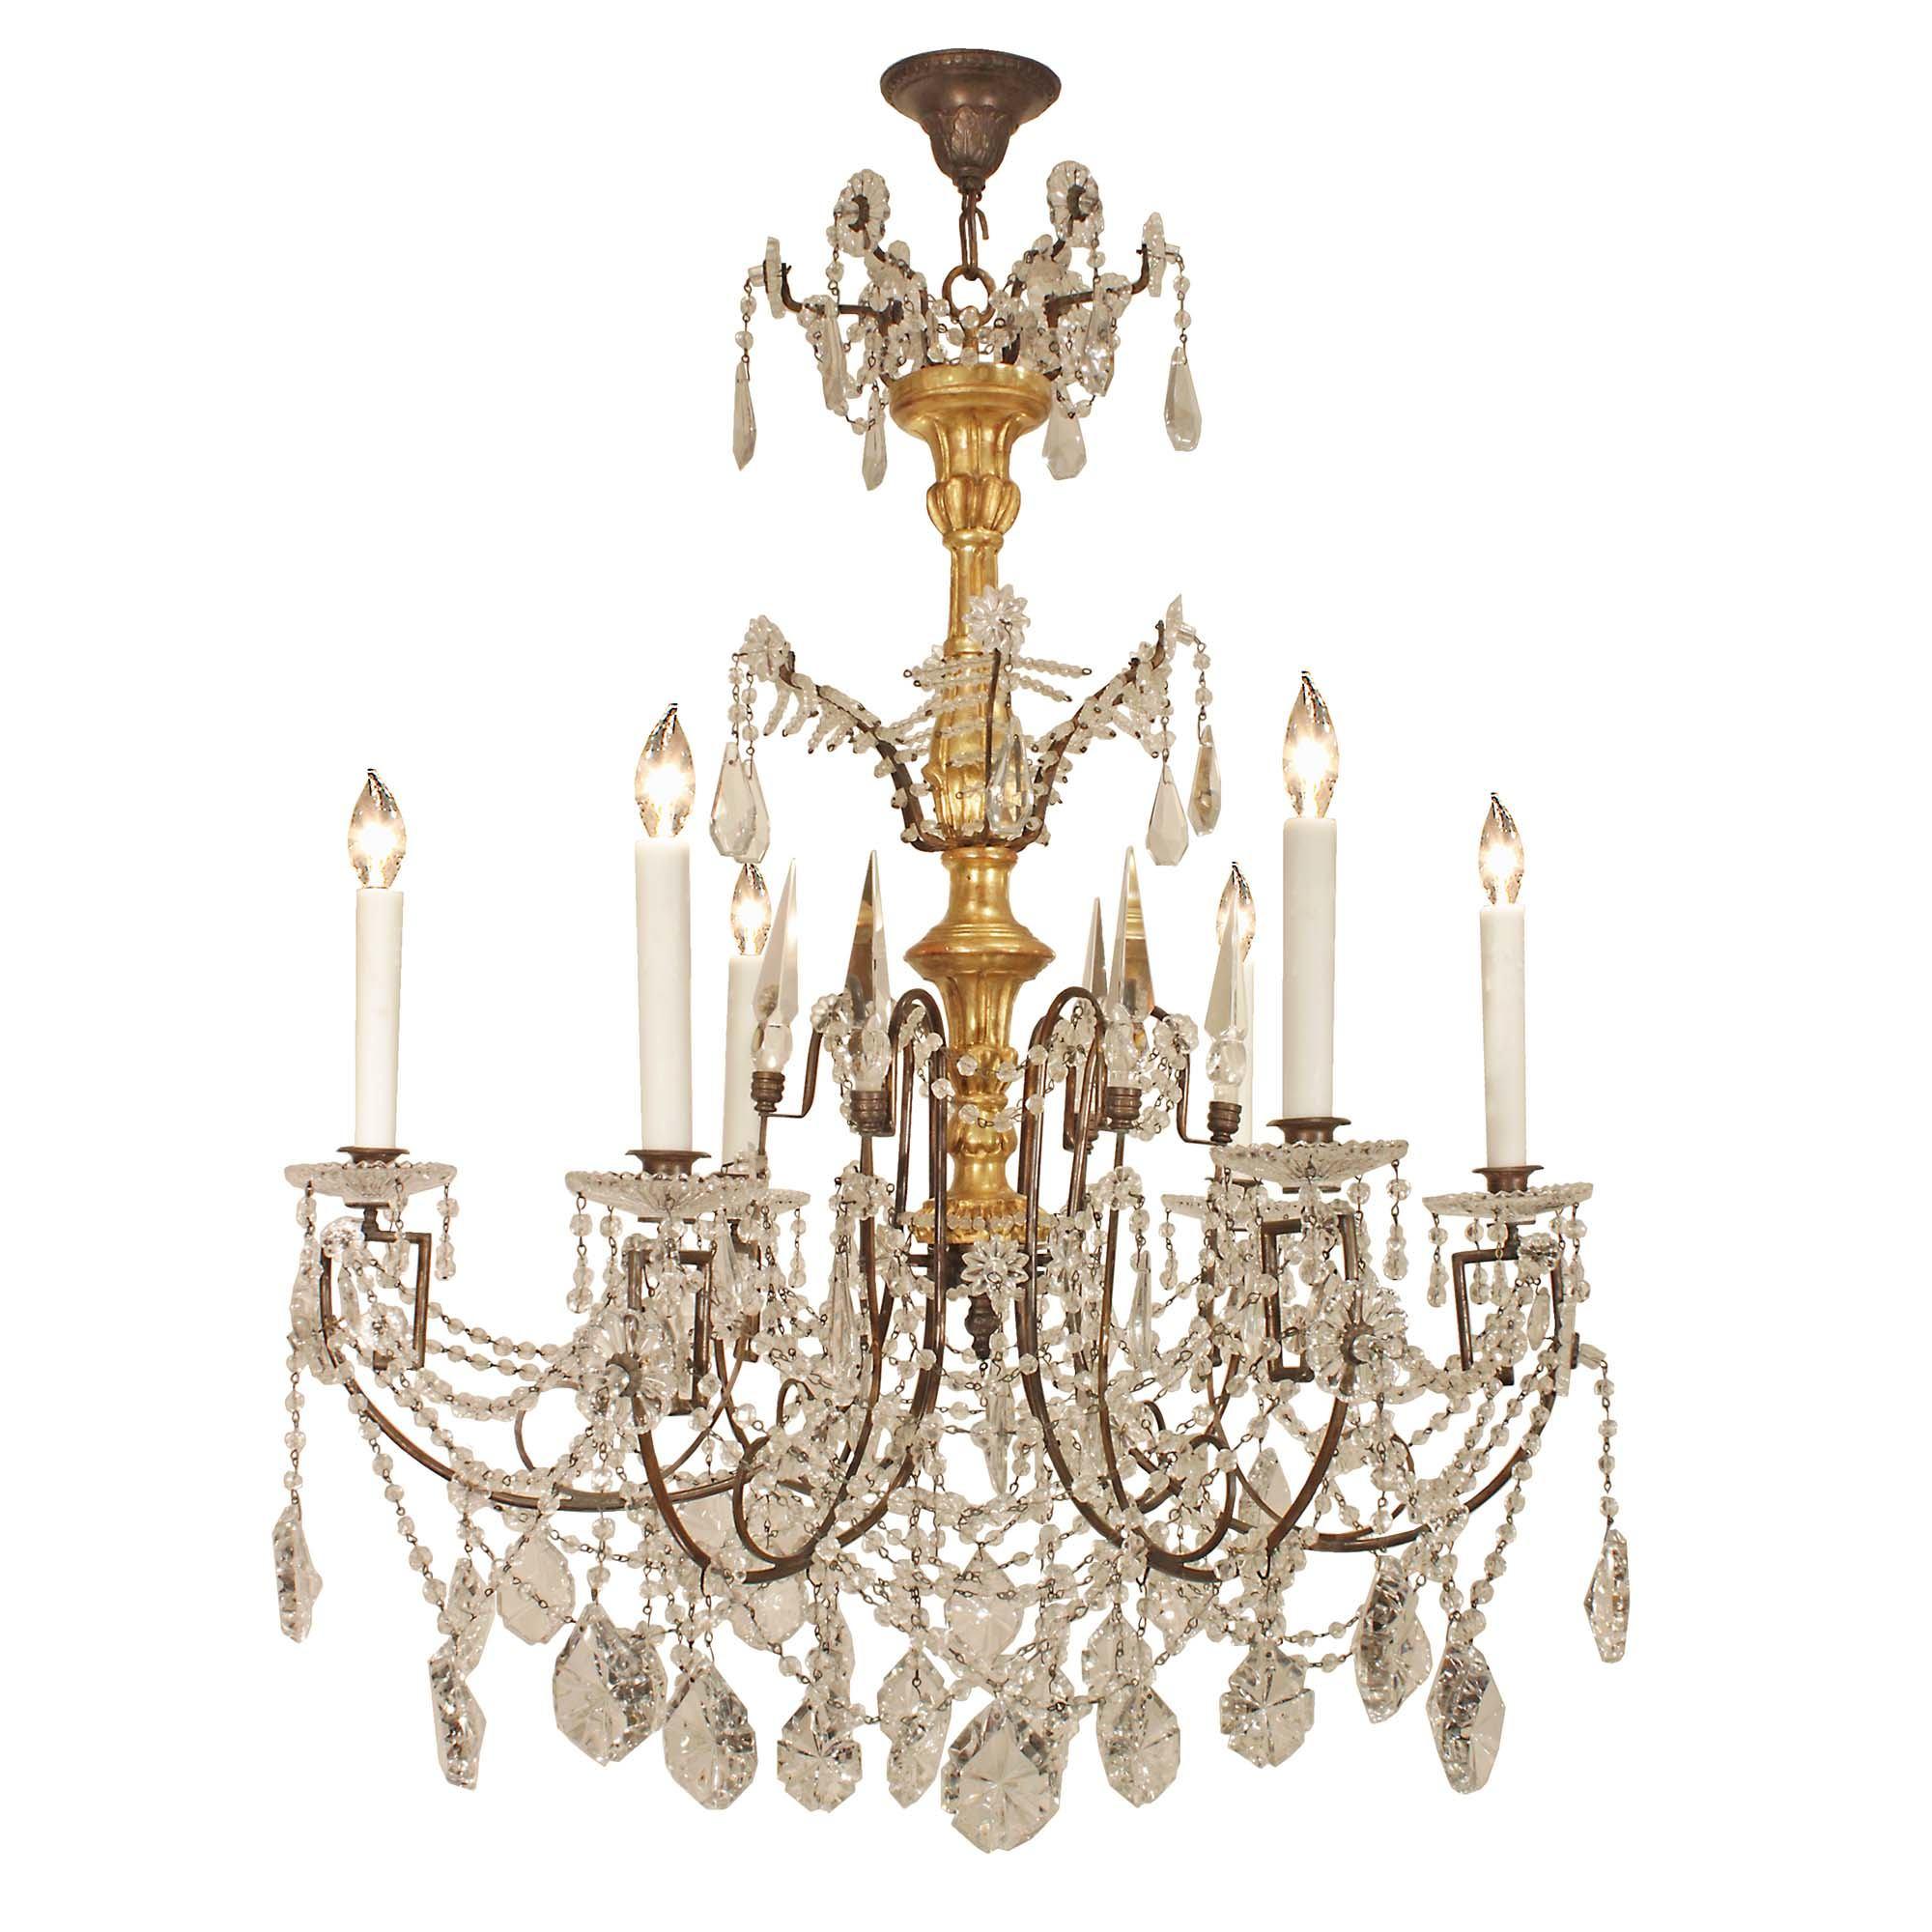 Italian 19th century gilt wood and crystal chandelier